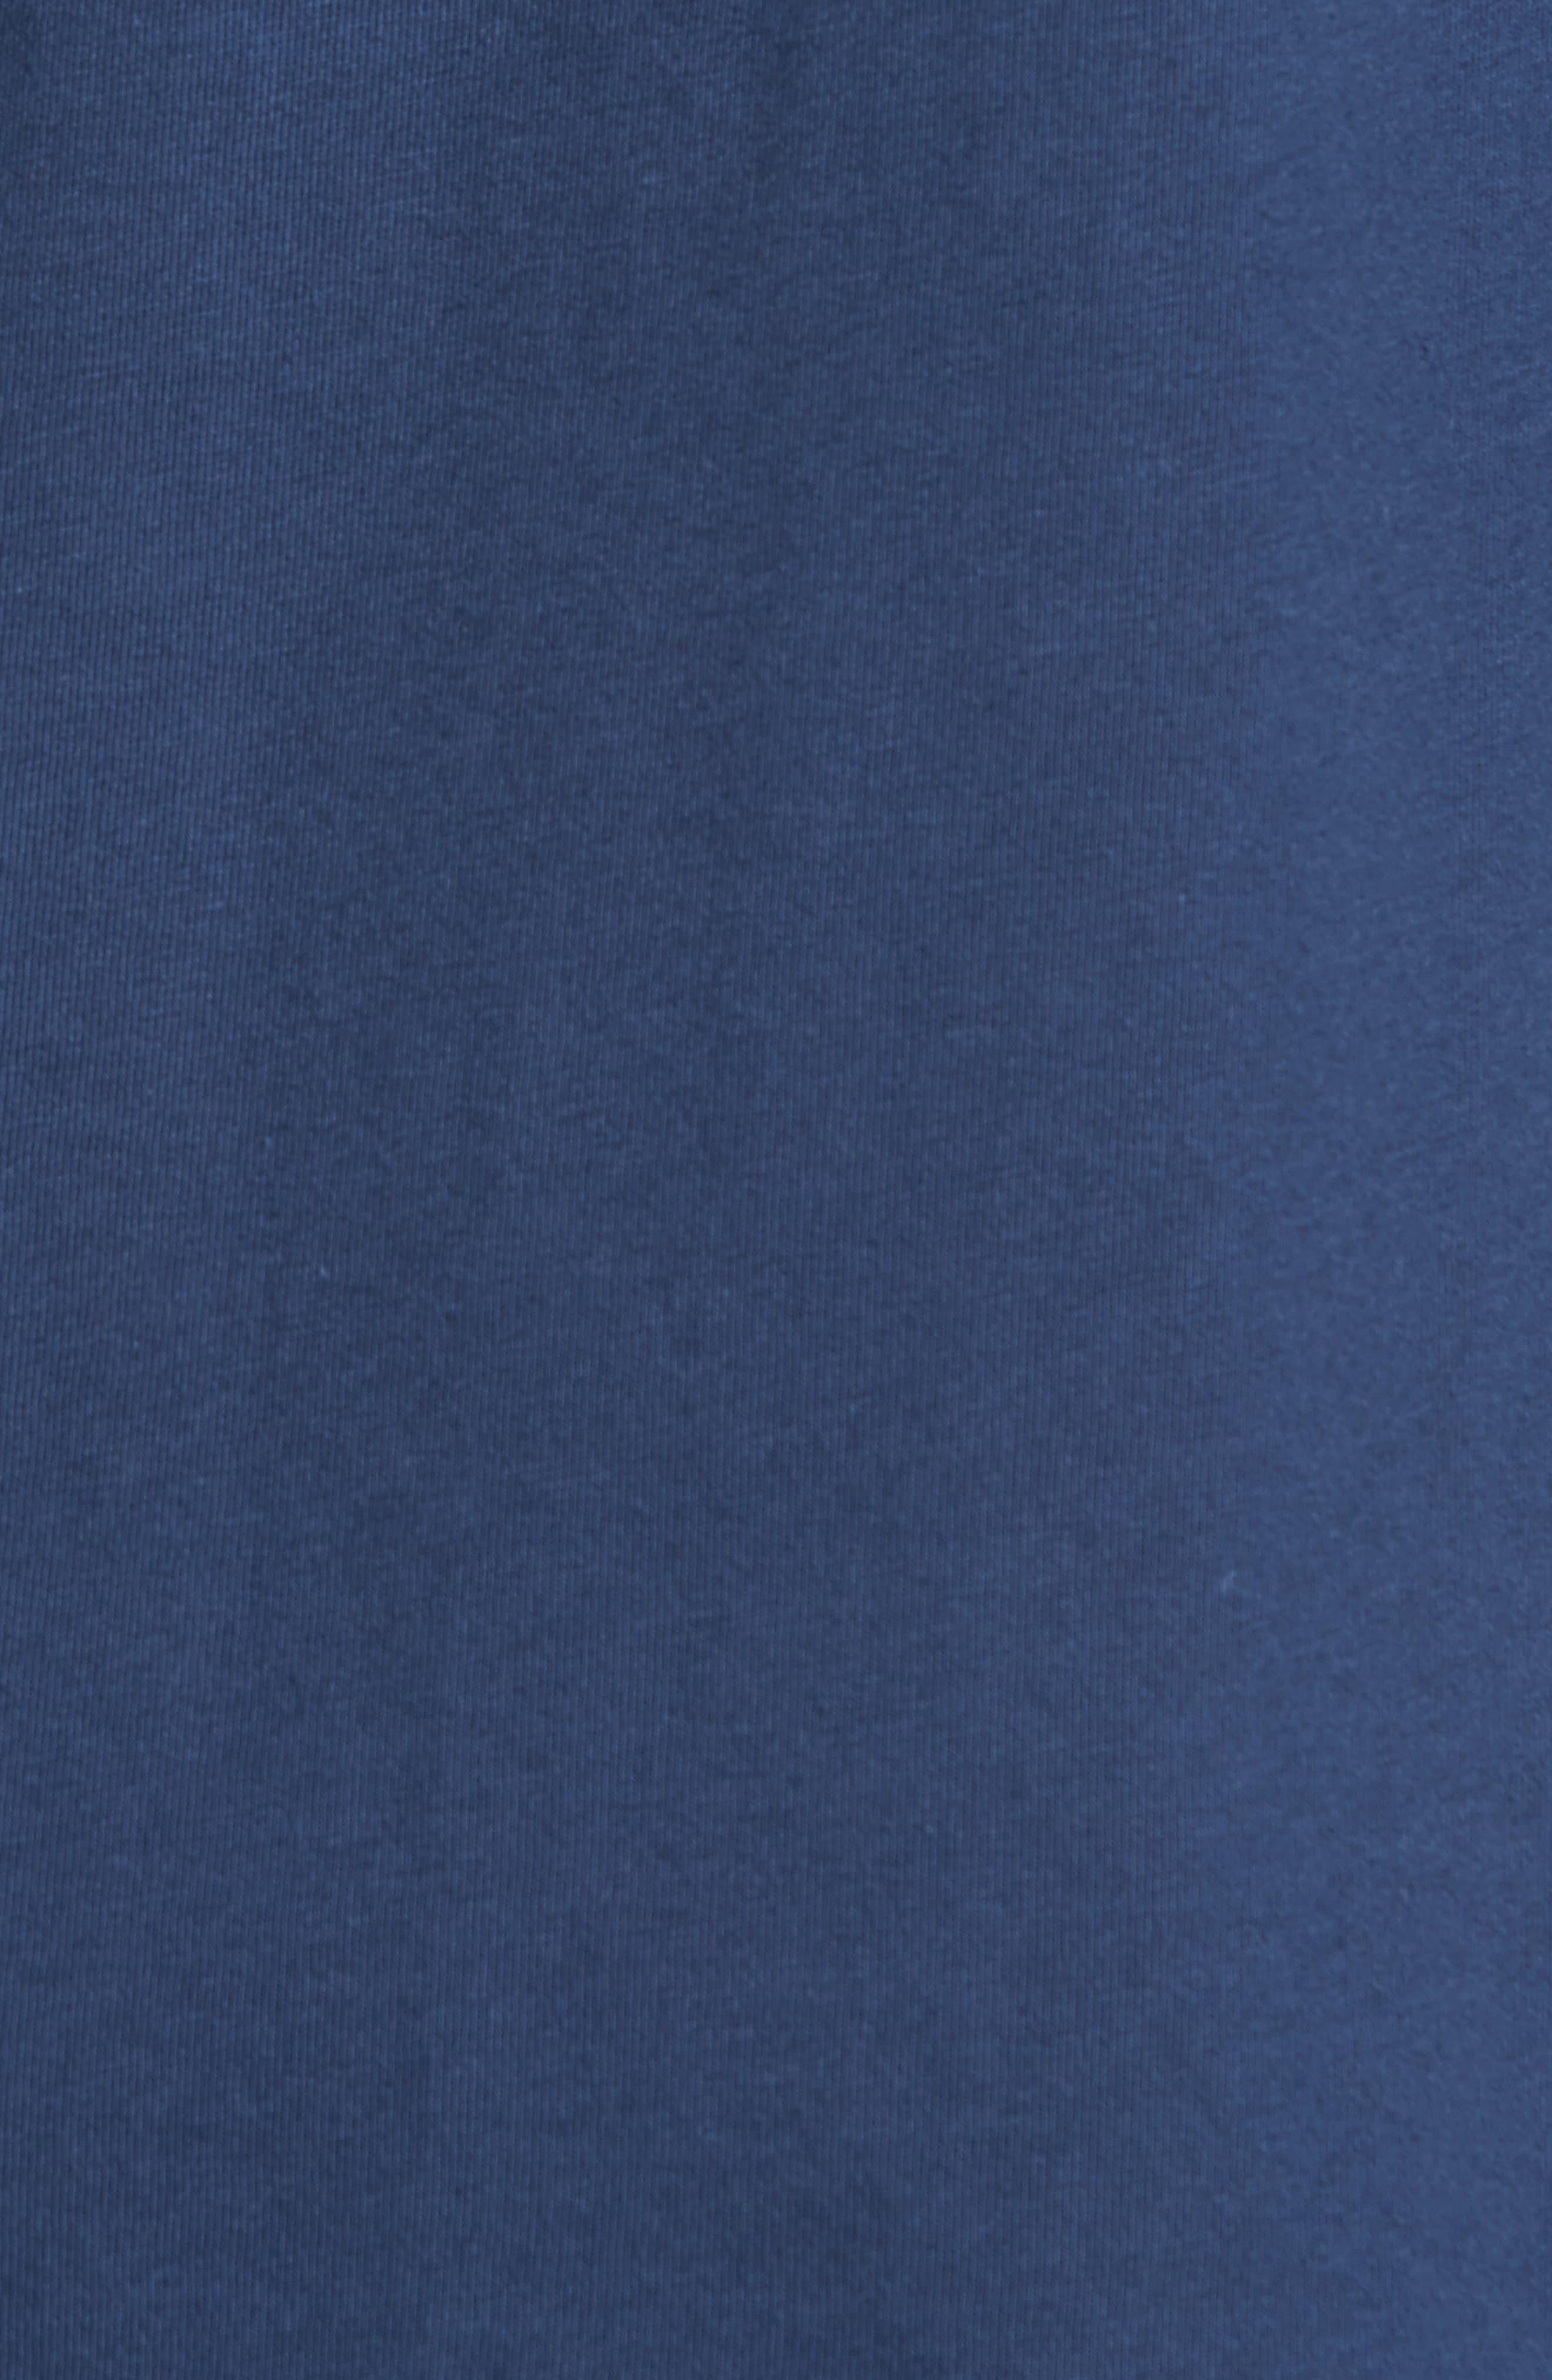 Parrot Sailing T-Shirt,                             Alternate thumbnail 5, color,                             Navy